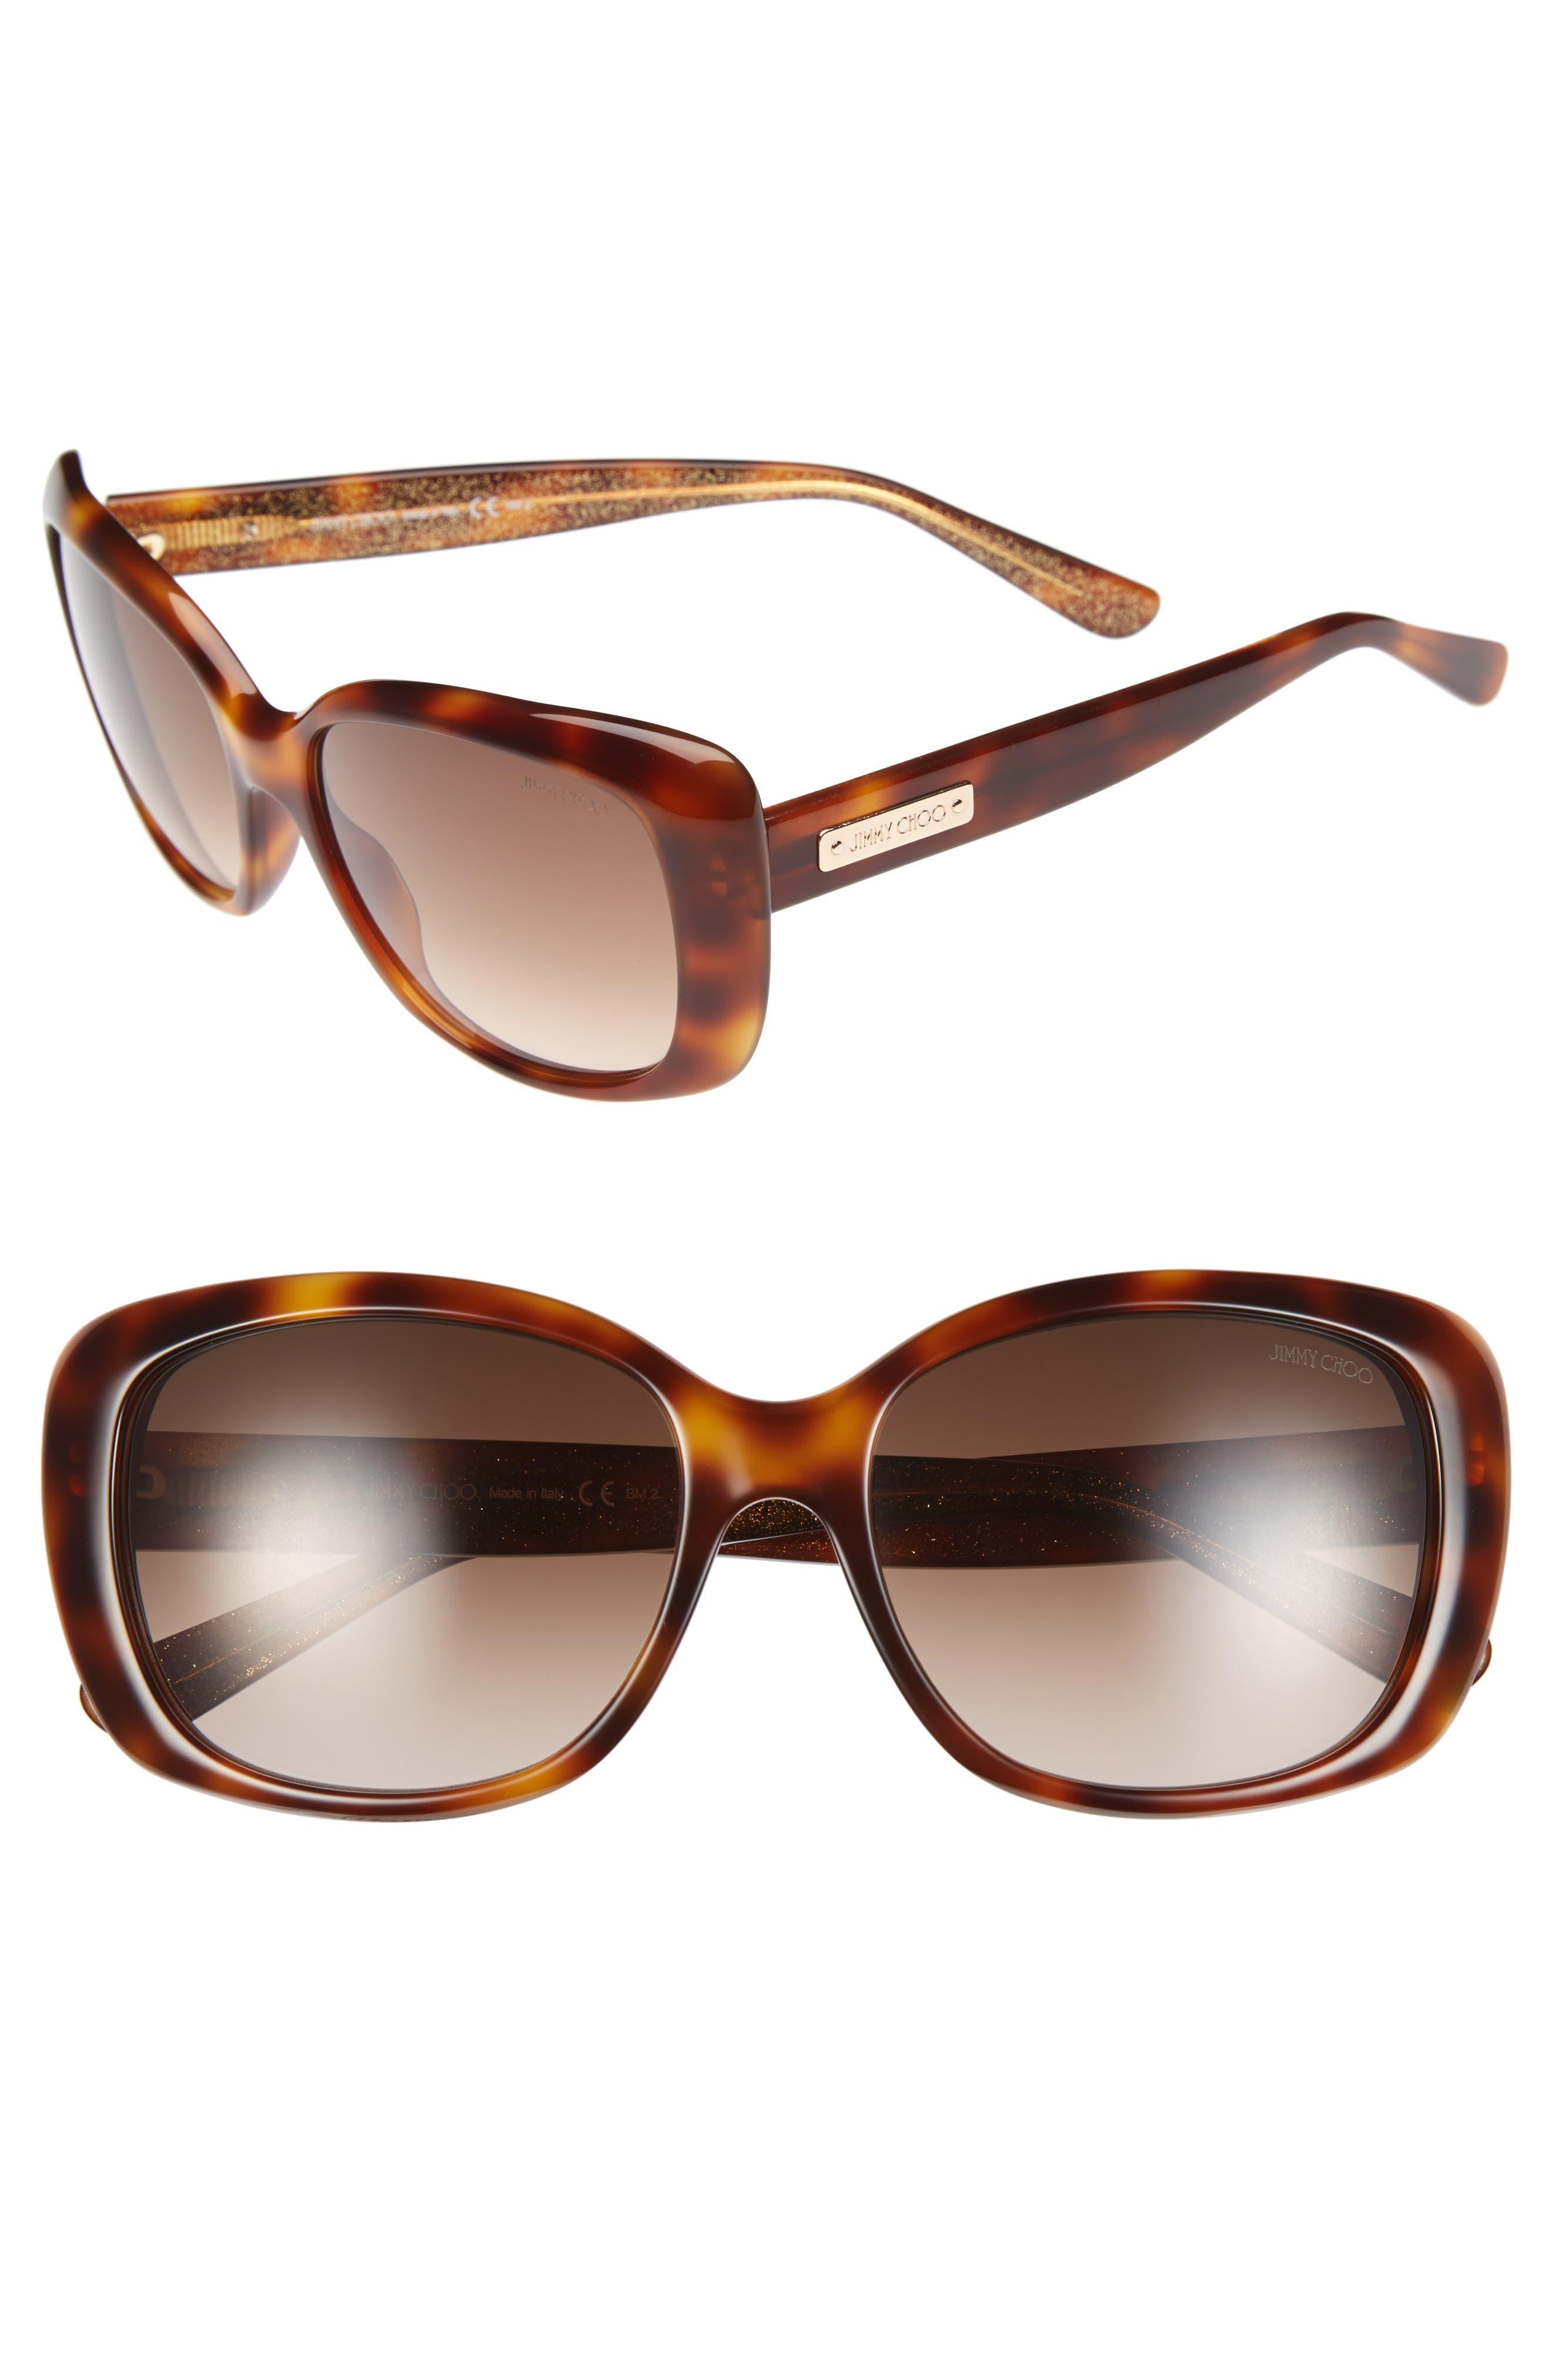 56mm Sunglasses,                             Alternate thumbnail 3, color,                             HAVANA